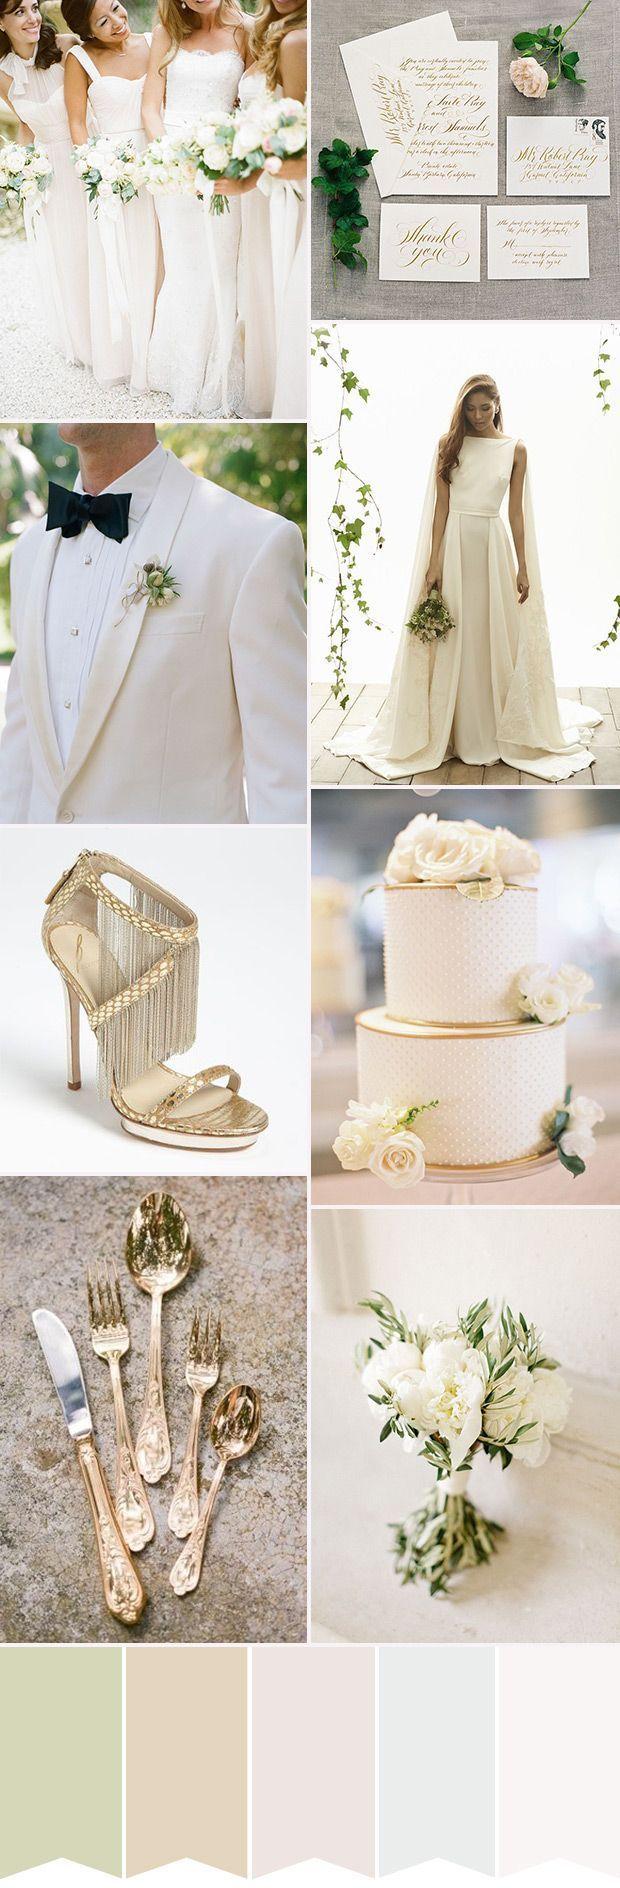 The Ultimate Glam: White Wedding Inspiration | Weddings, Wedding and ...